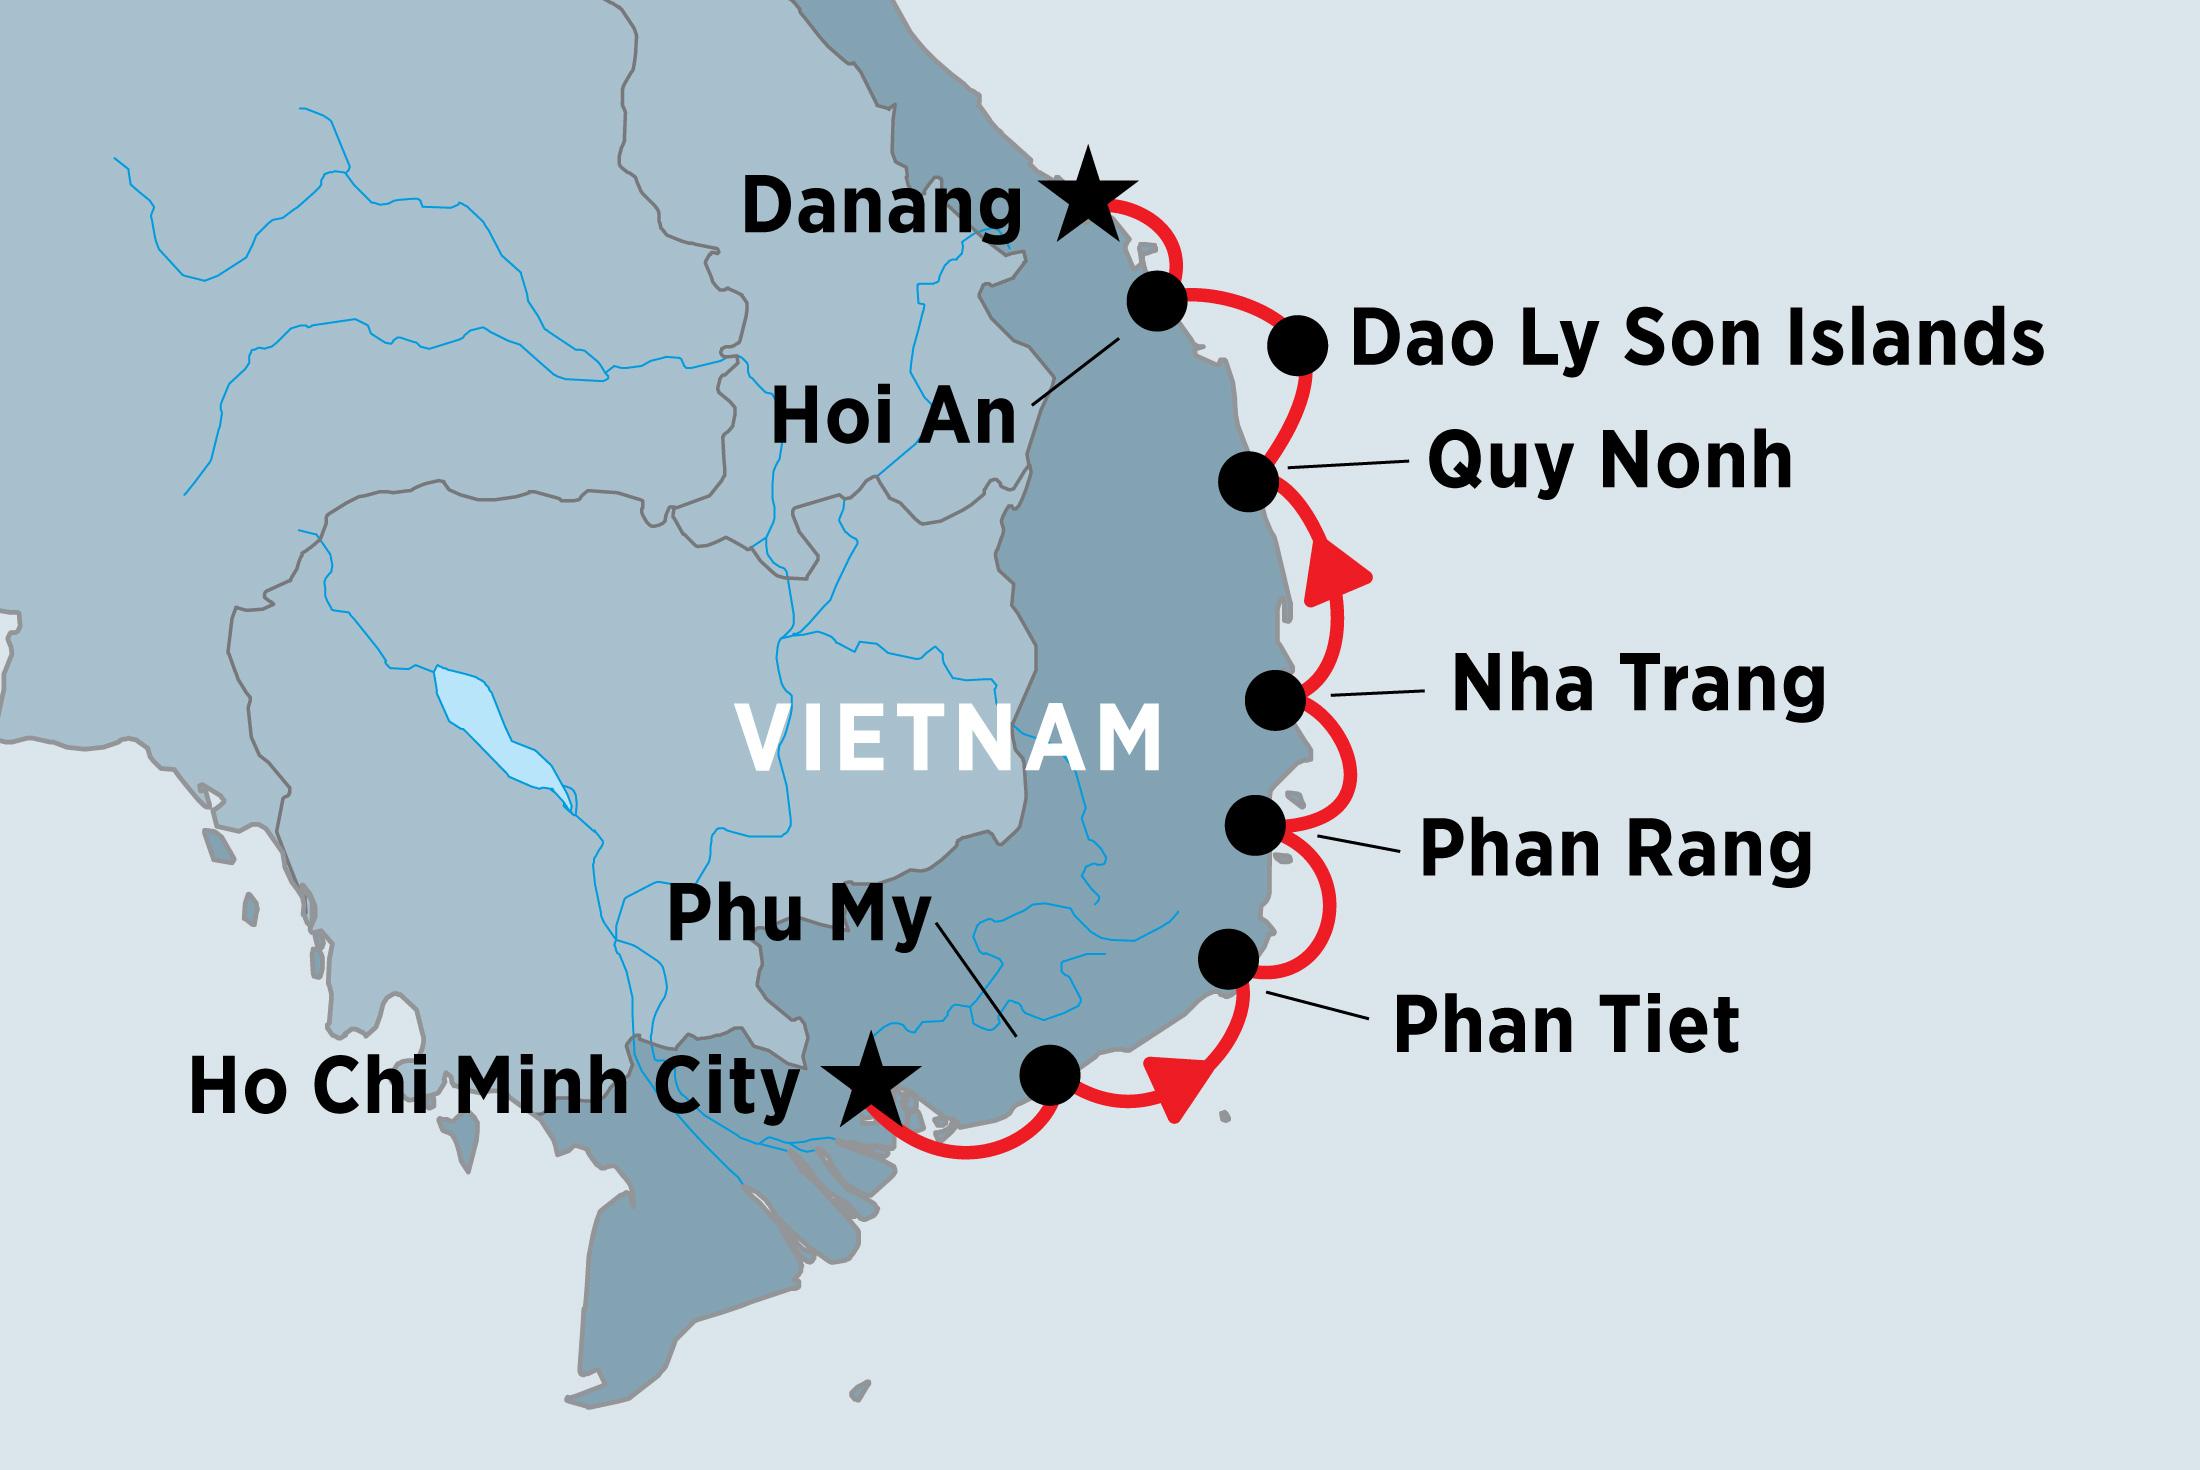 South Vietnam Coastal Cruising Ho Chi Minh To Danang Peregrine